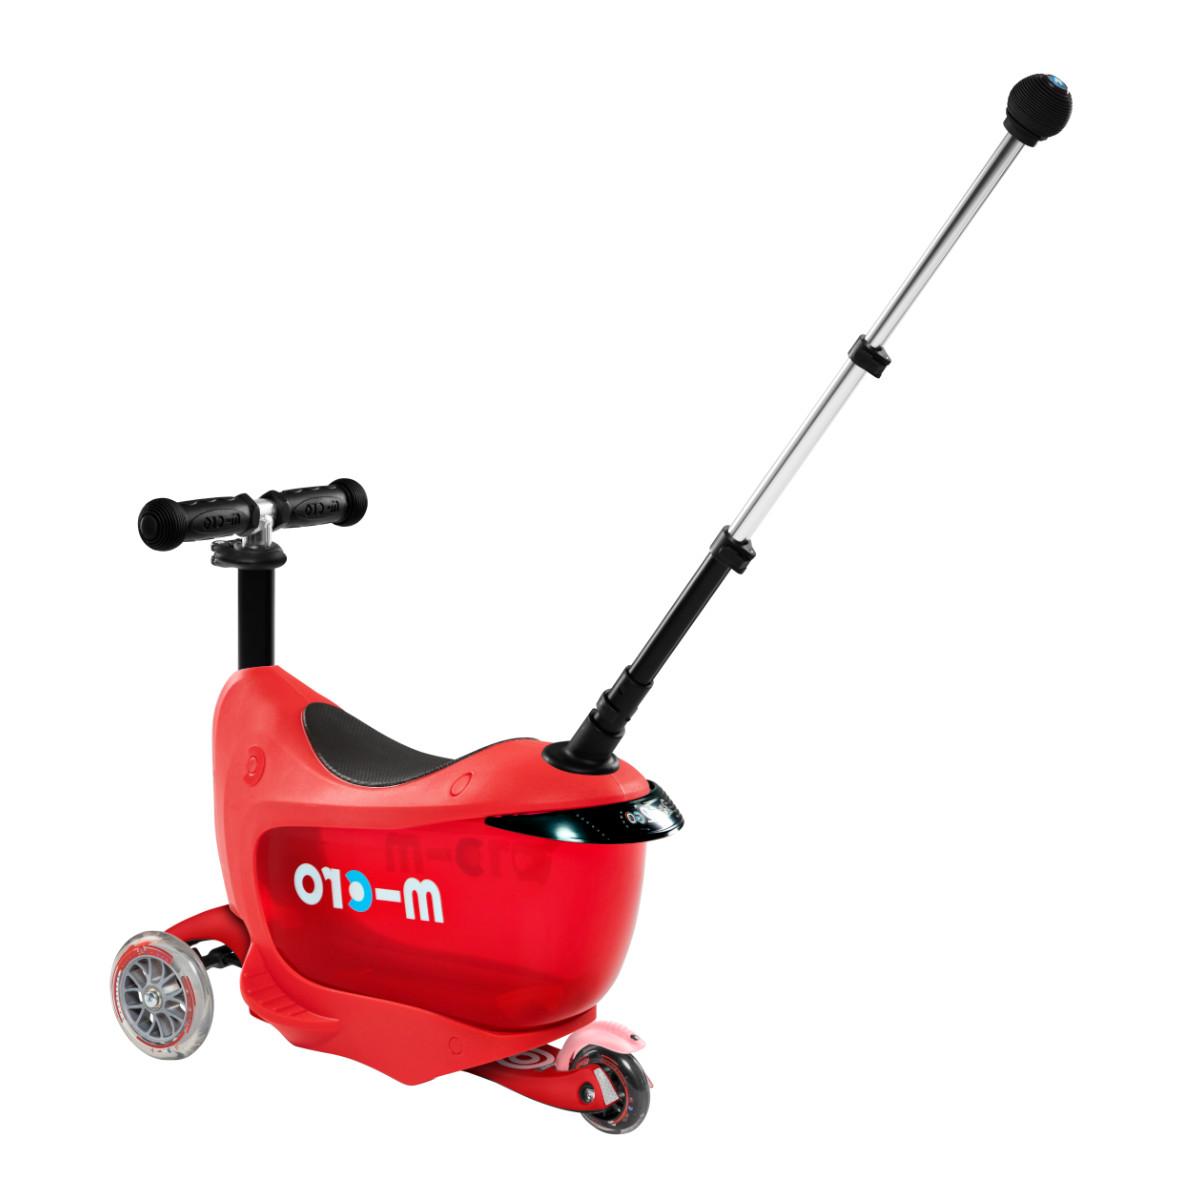 Micro Mini2go Deluxe Plus Red - 03